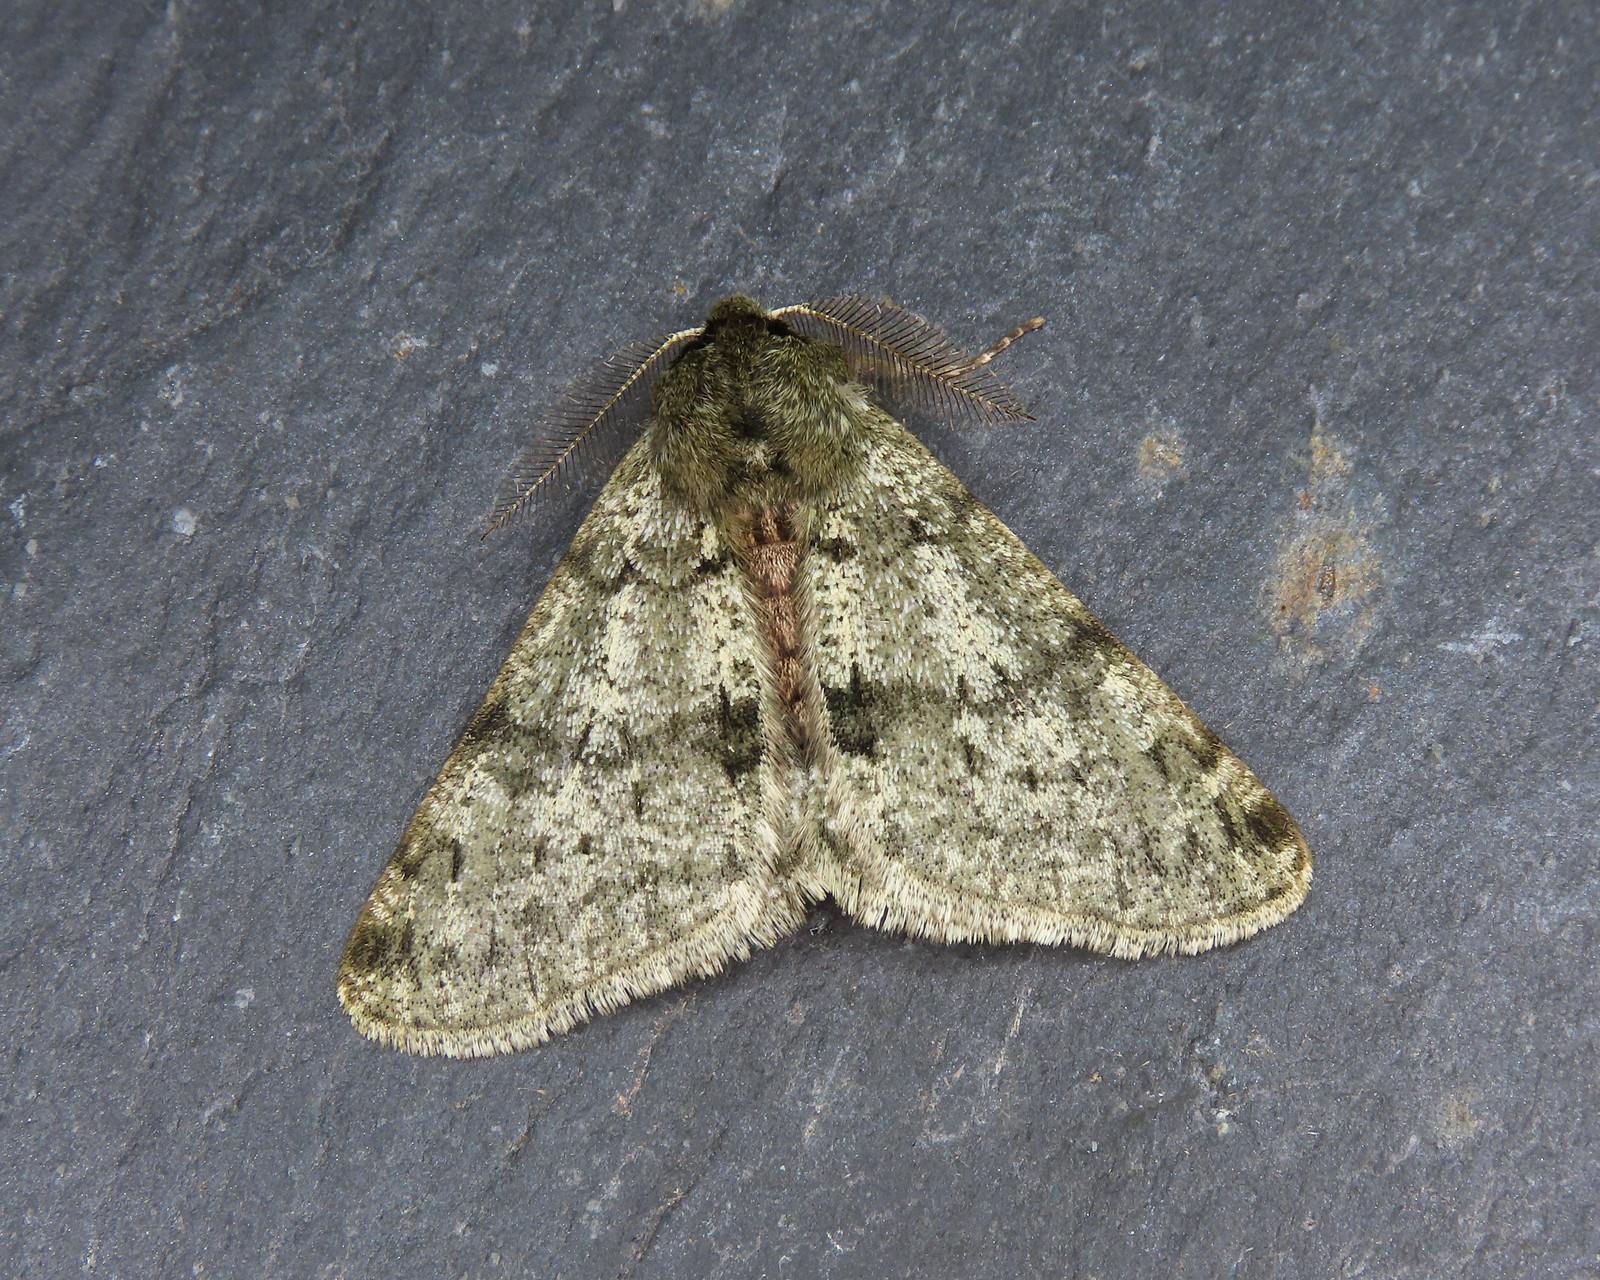 70.247 Pale Brindled Beauty - Phigalia pilosaria